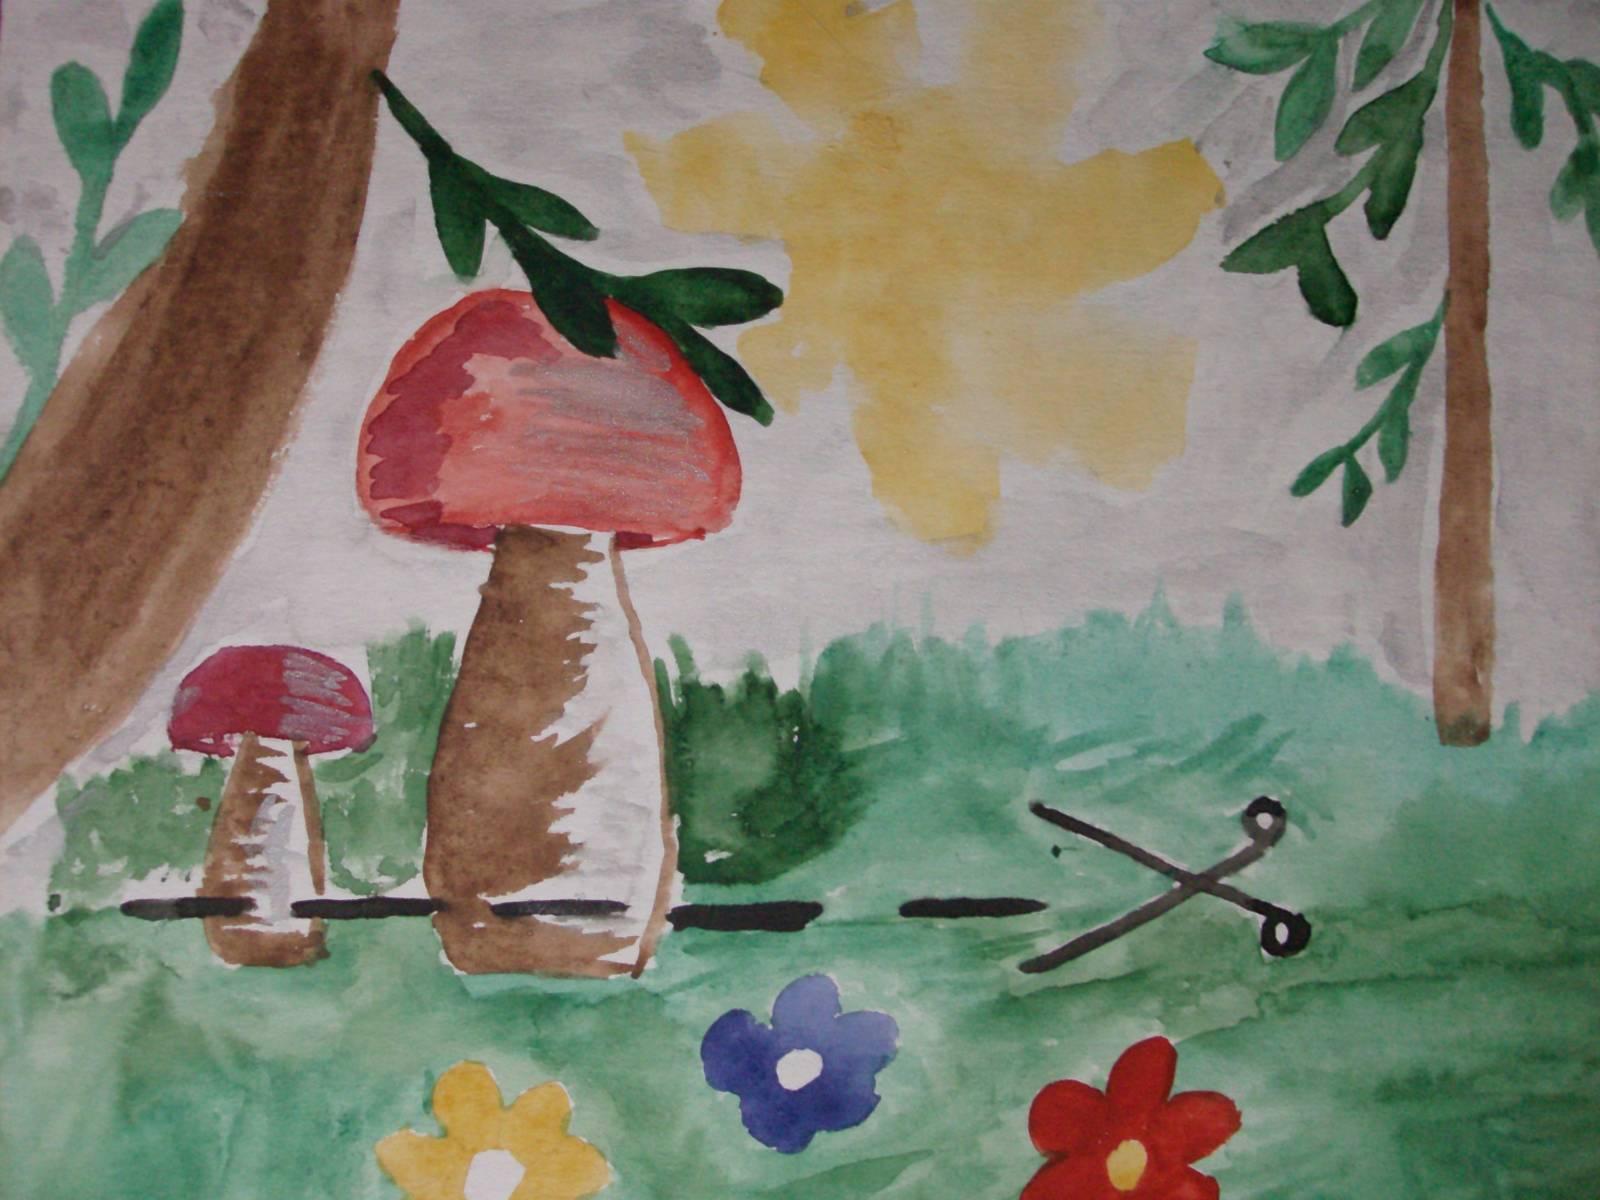 берегите грибы фото